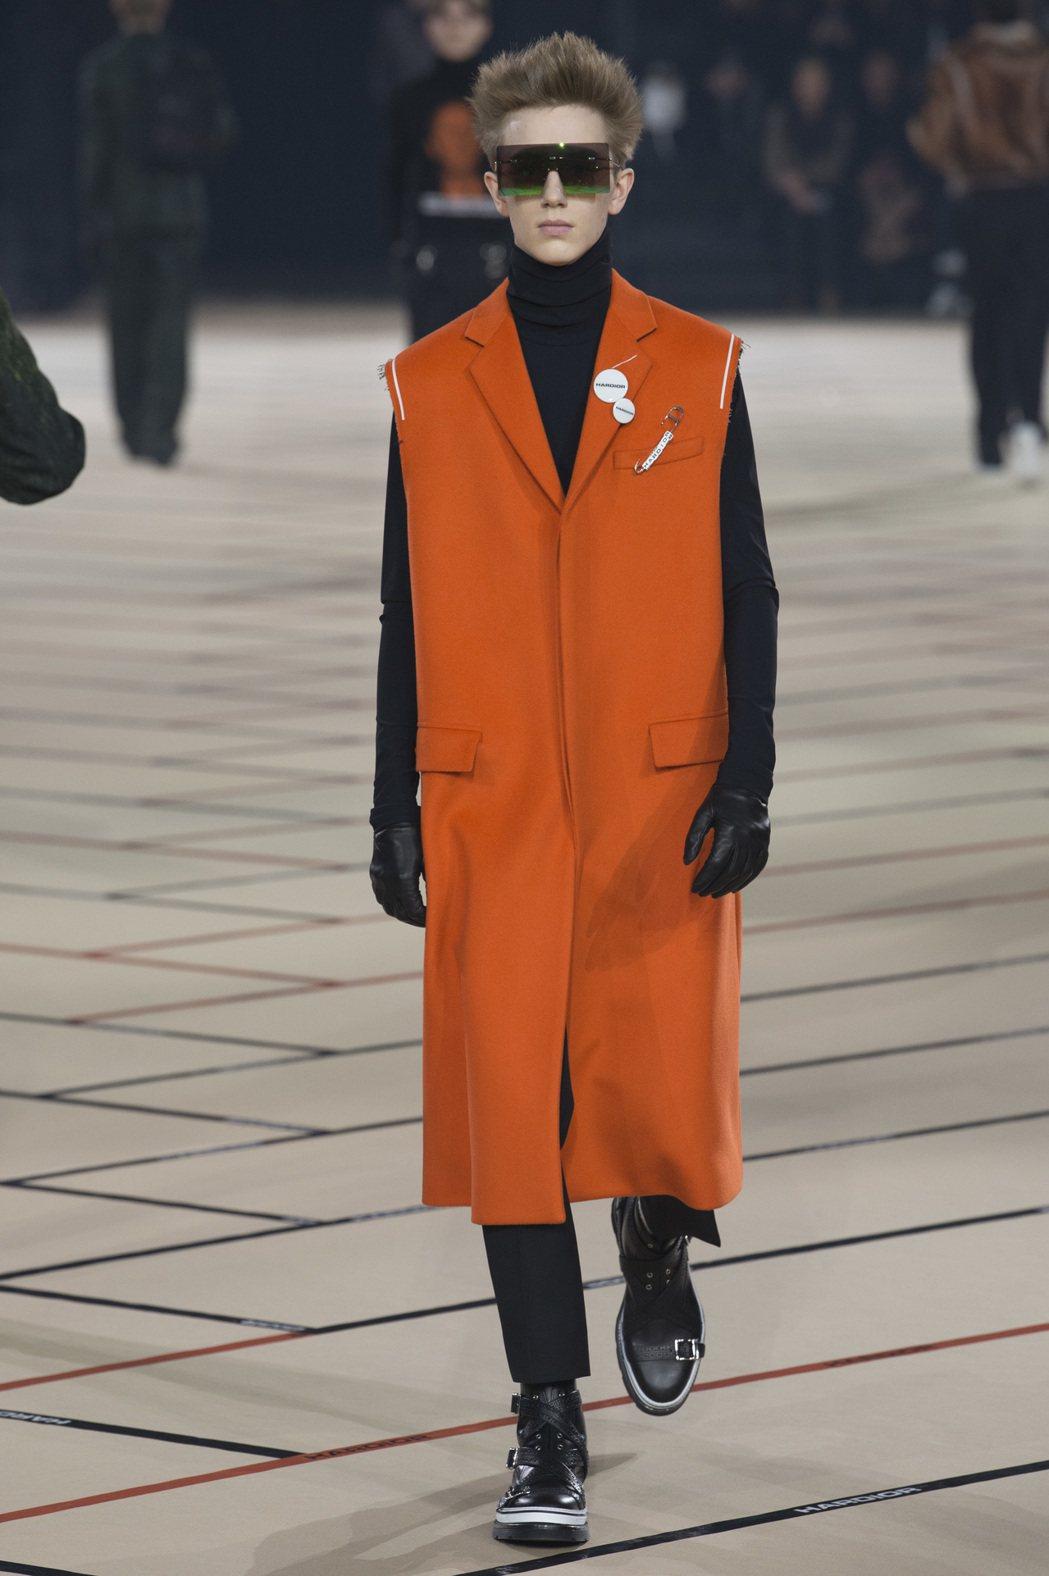 Dior Homme顛覆傳統,把西裝剪裁框架重新解構,加入街頭風格。圖/Dior...